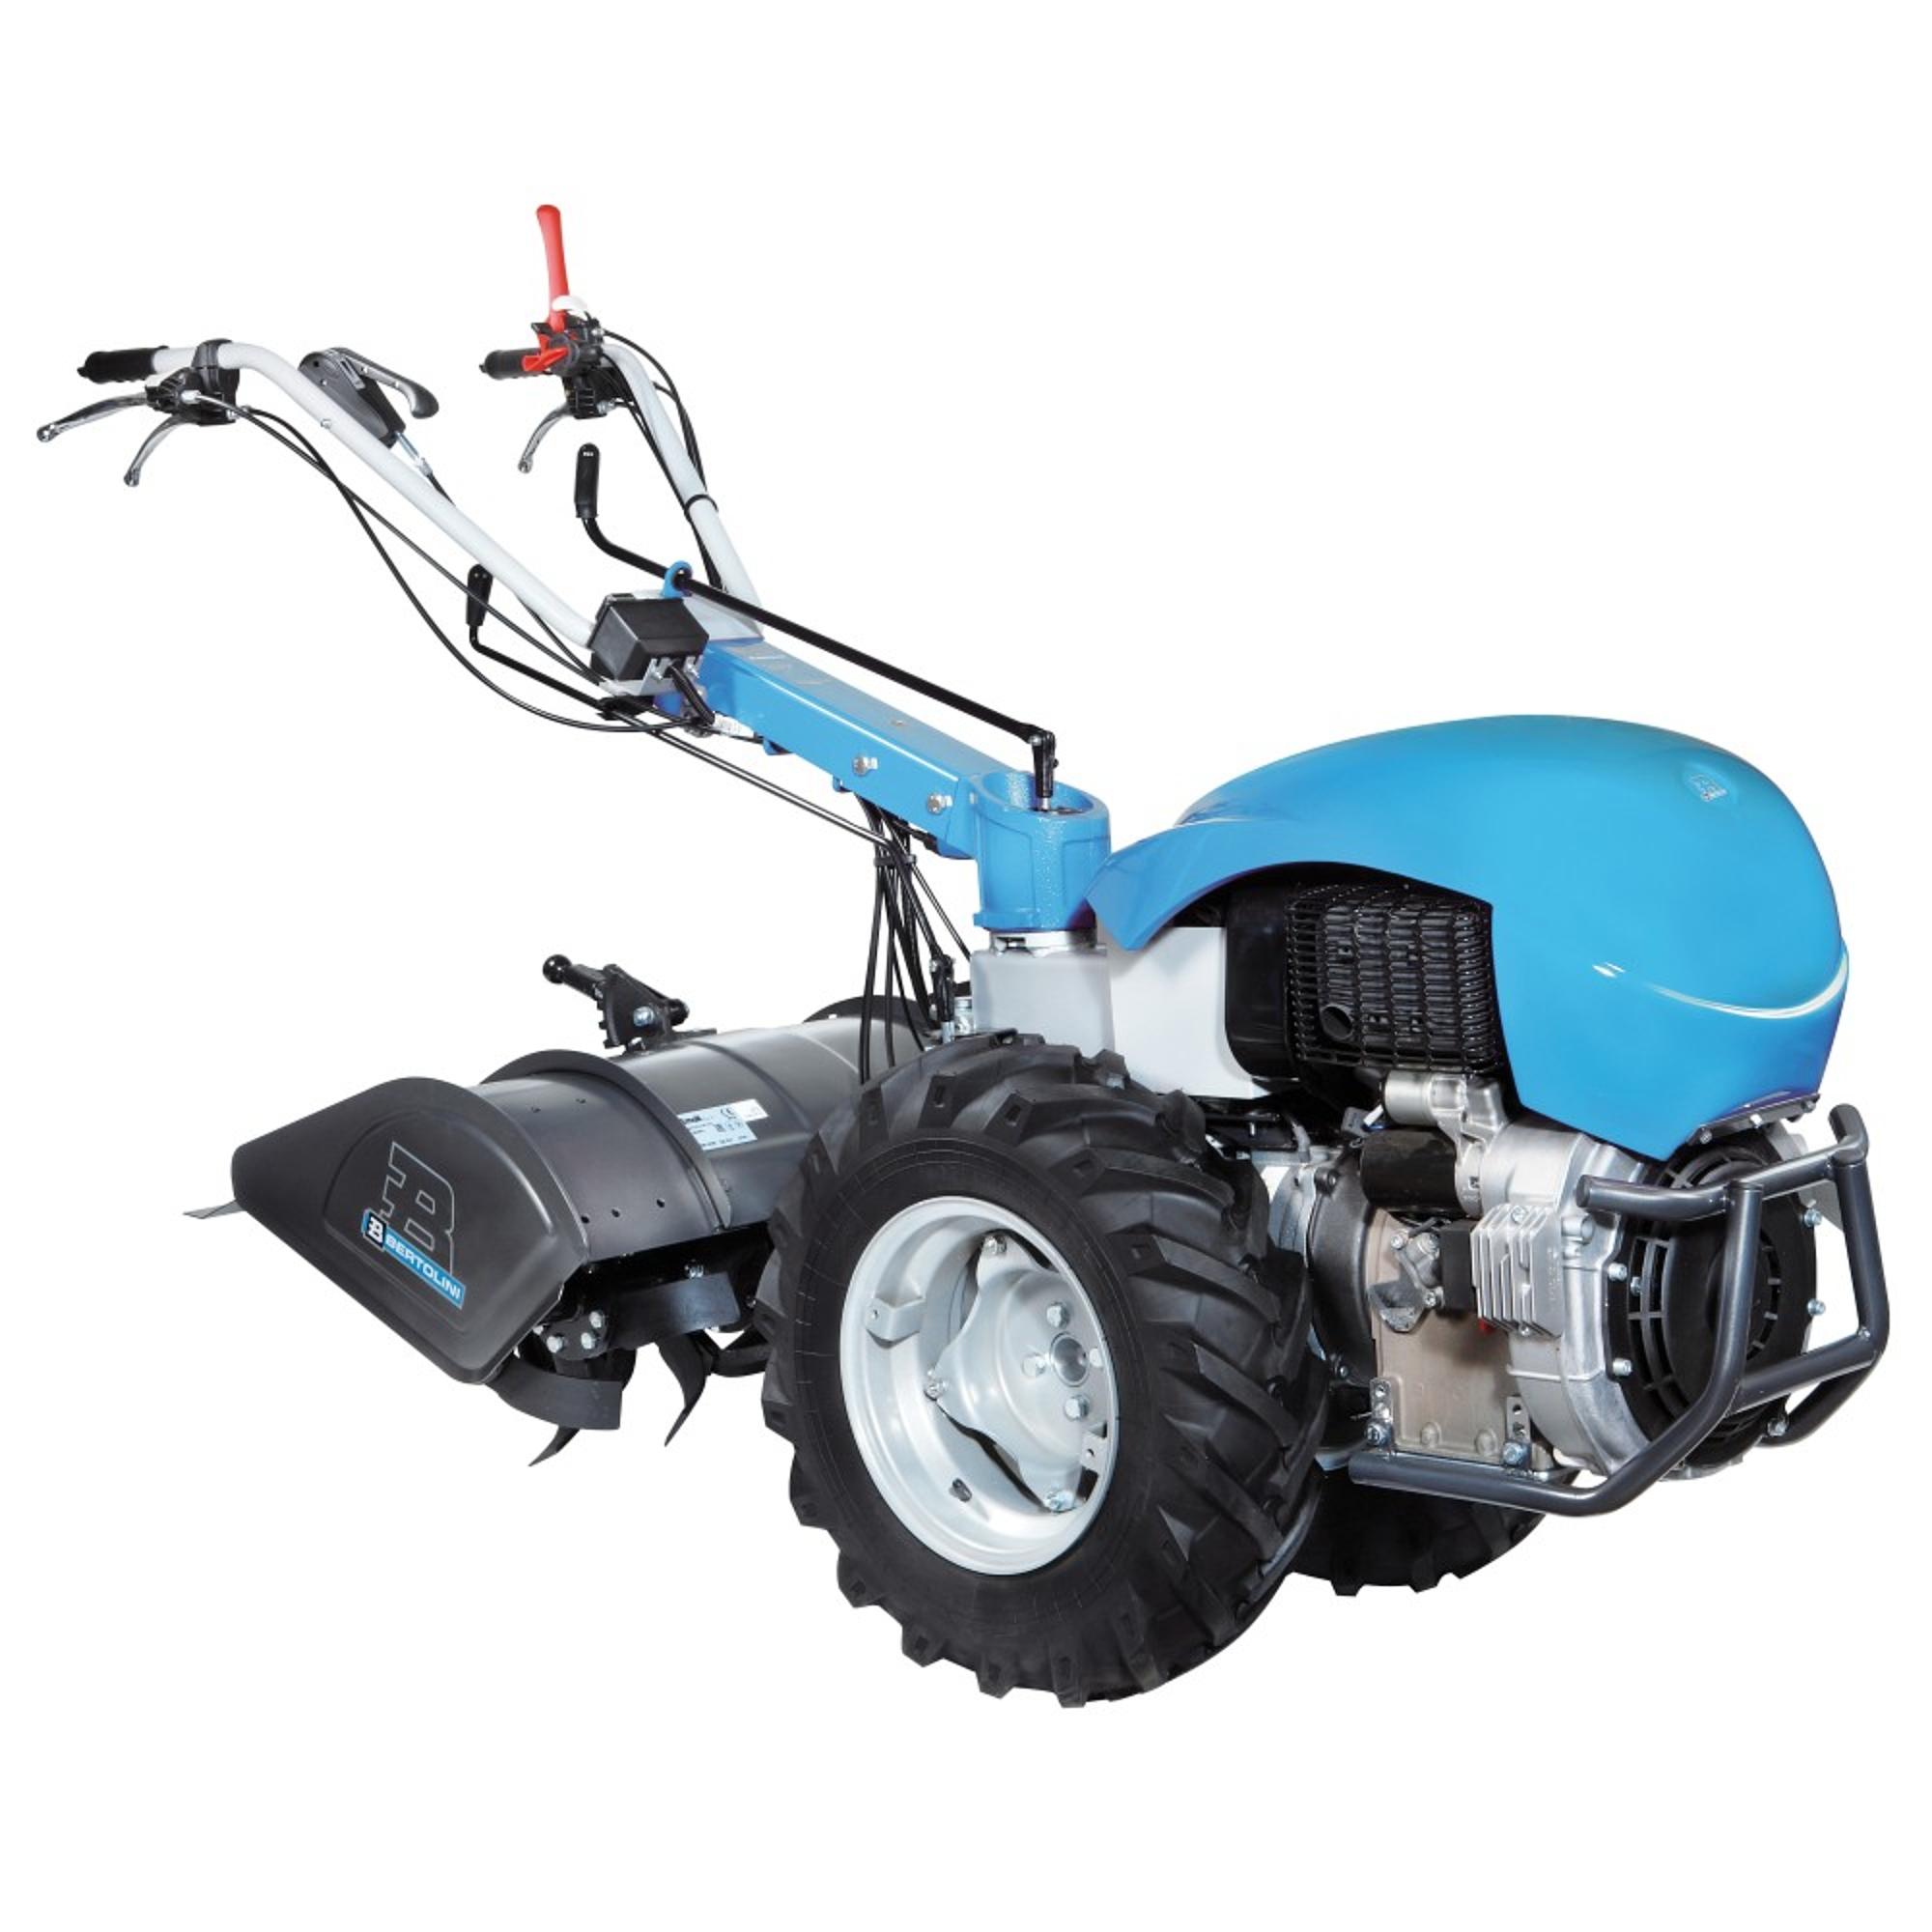 Bertolini Kultivátor Alapgép BT 417 S Lombardini 15LD510 motorral 68339104EN